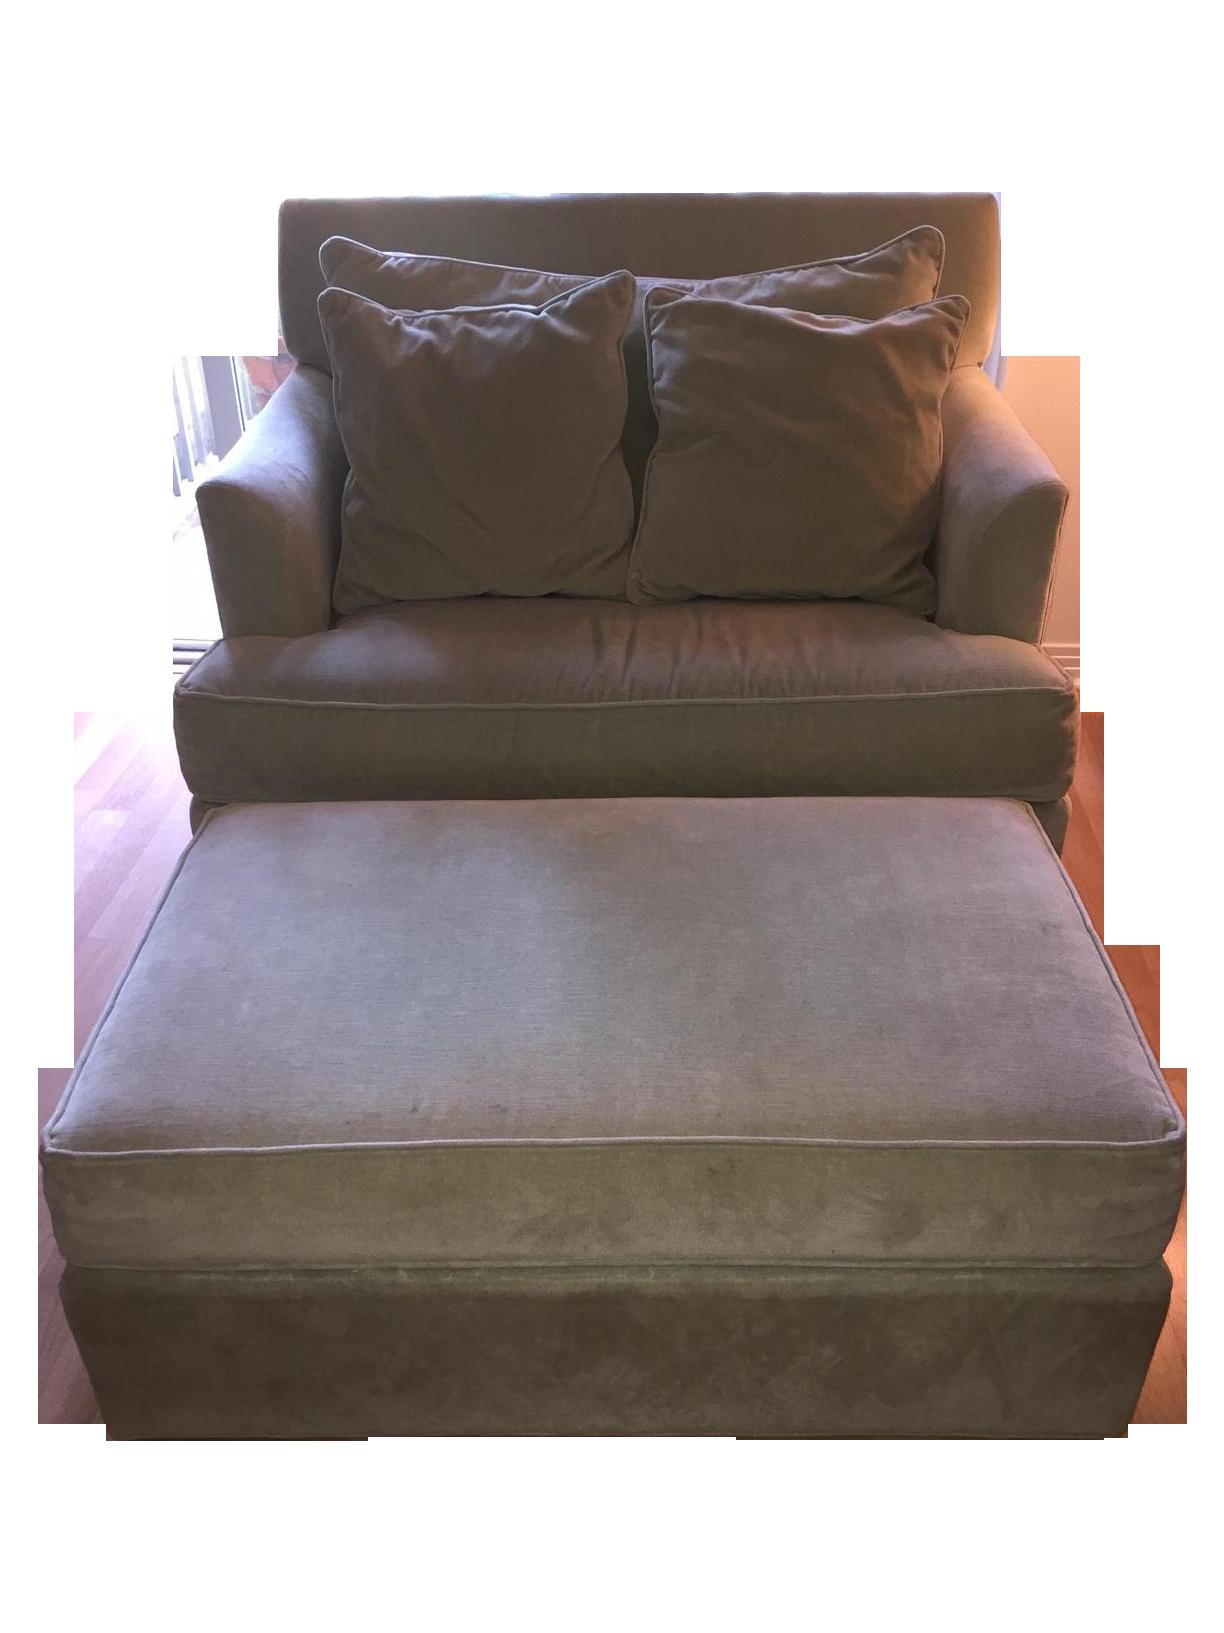 Ethan Allen Chair and a Half & Ottoman